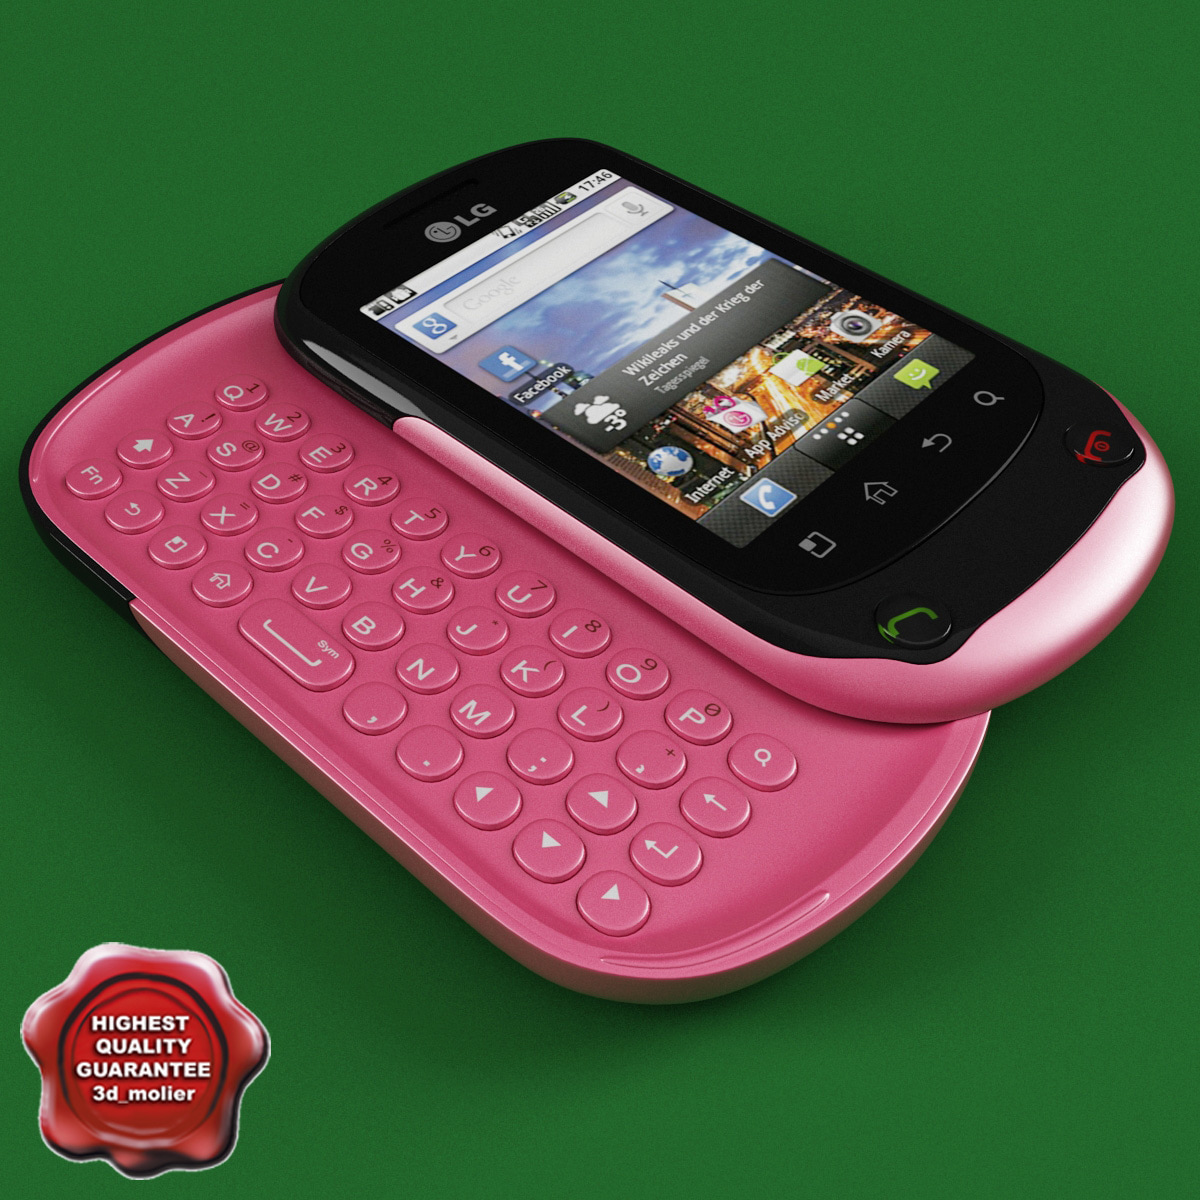 LG_C550_Optimus_Chat_Pink_00.jpg